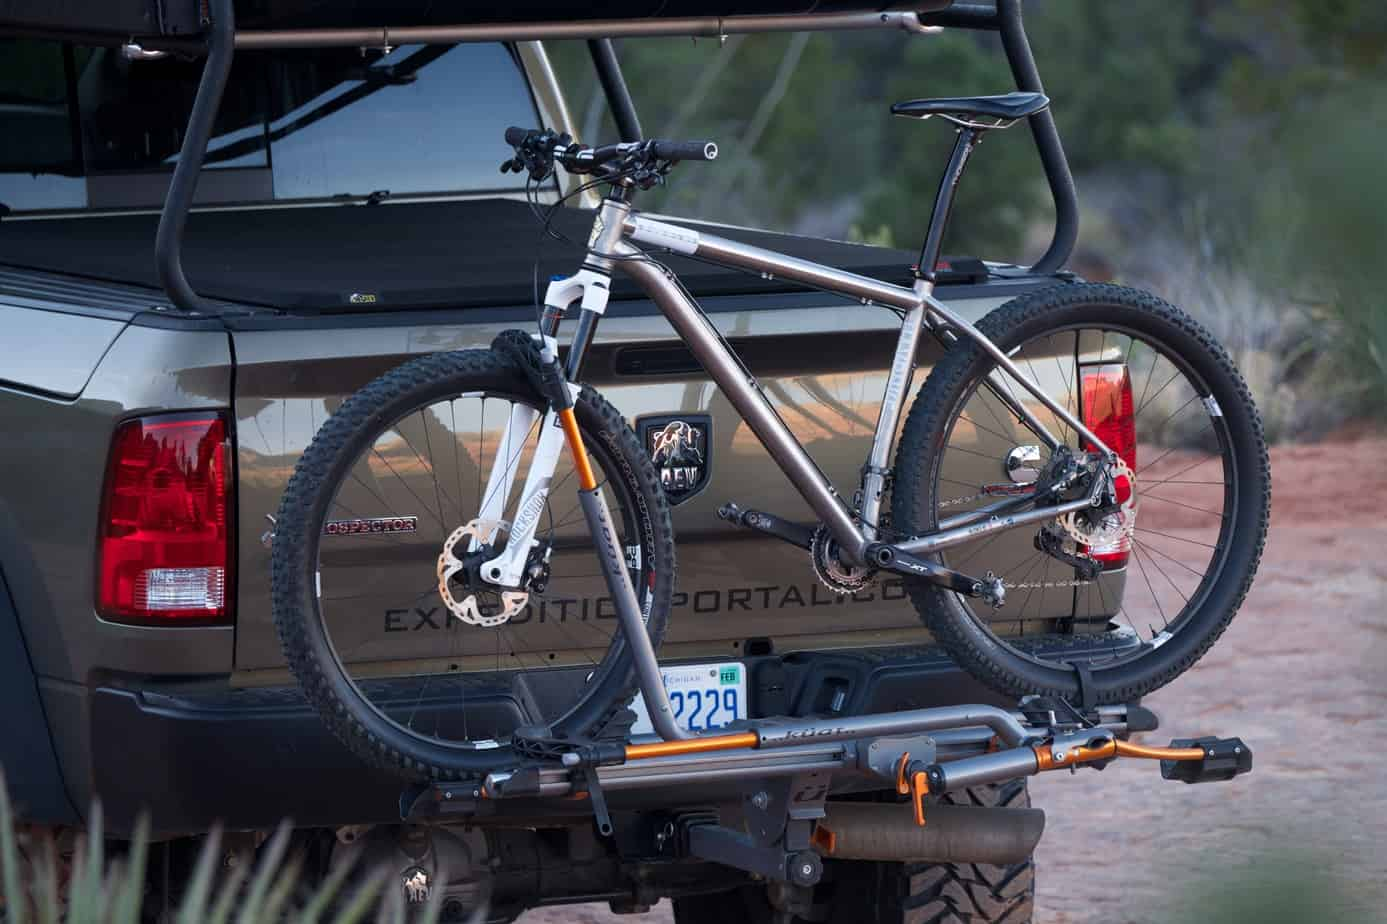 freedom kuat bike blog vehicle hauling saris bikes reviews buying to fat guide rack racks